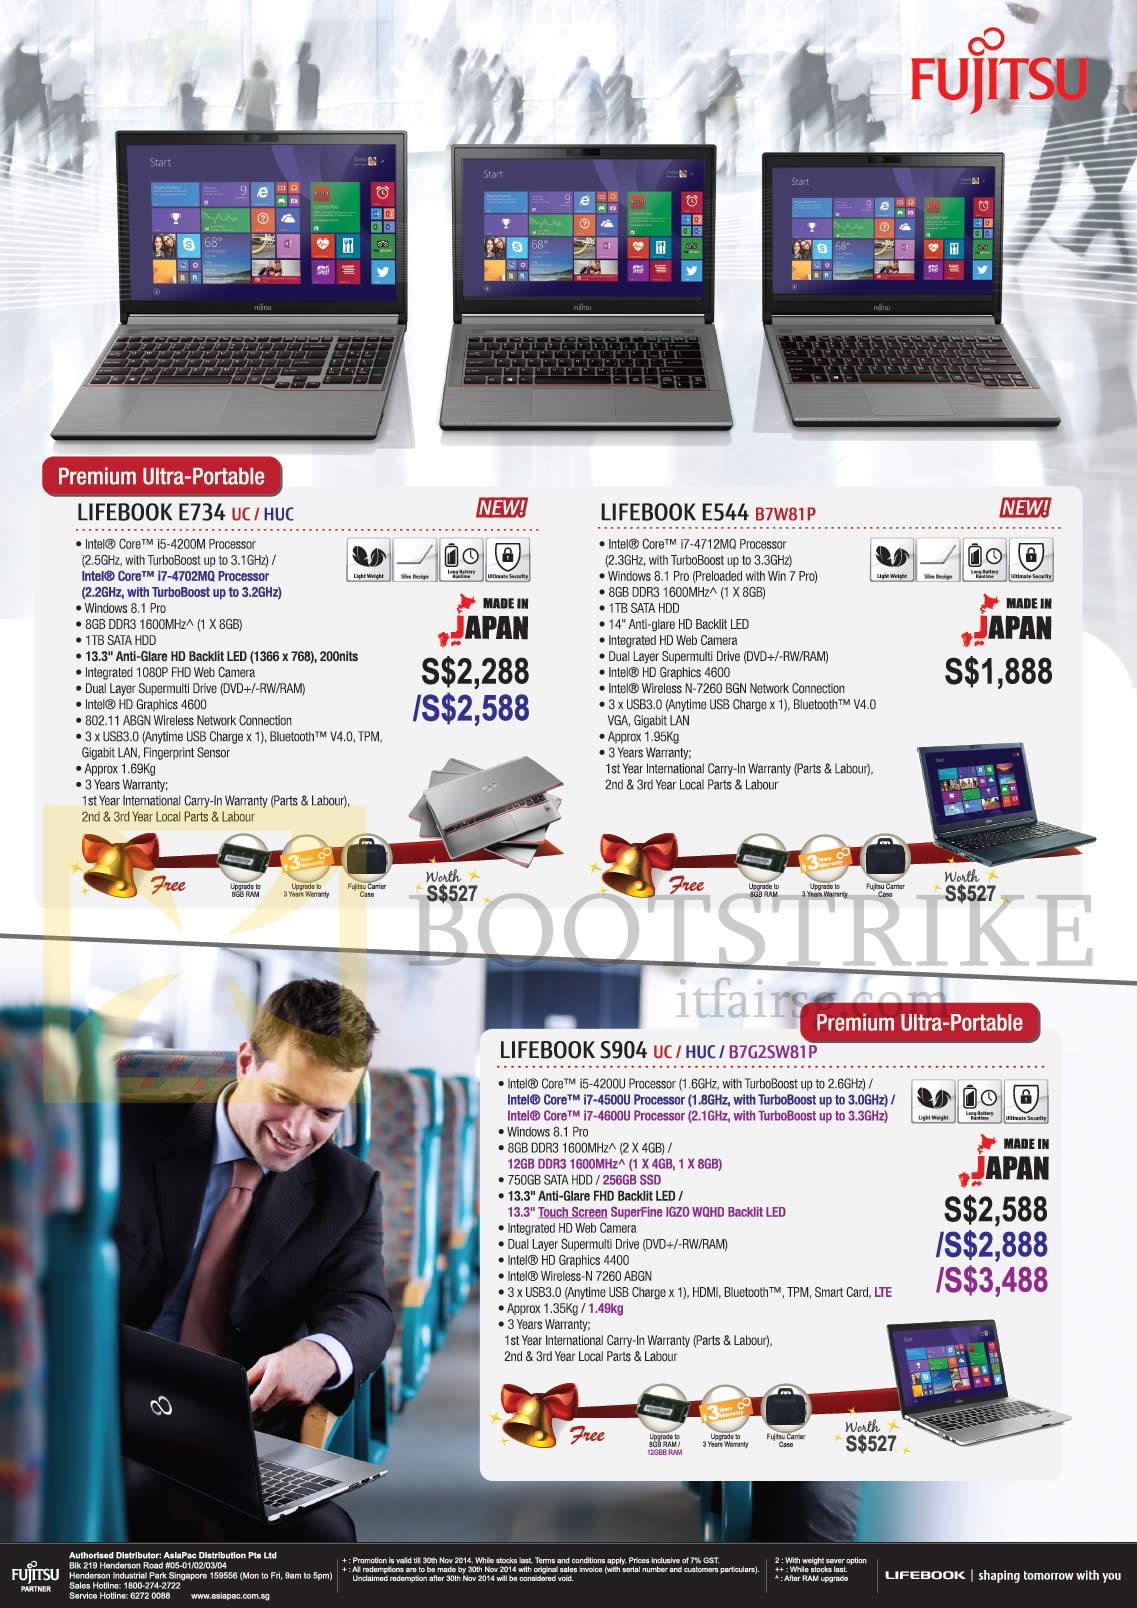 SITEX 2014 price list image brochure of Fujitsu Notebooks Lifebook E734 UC HUC, Lifebook E544 B7W81P, Lifebook S904 UC HUC B7G2SW81P